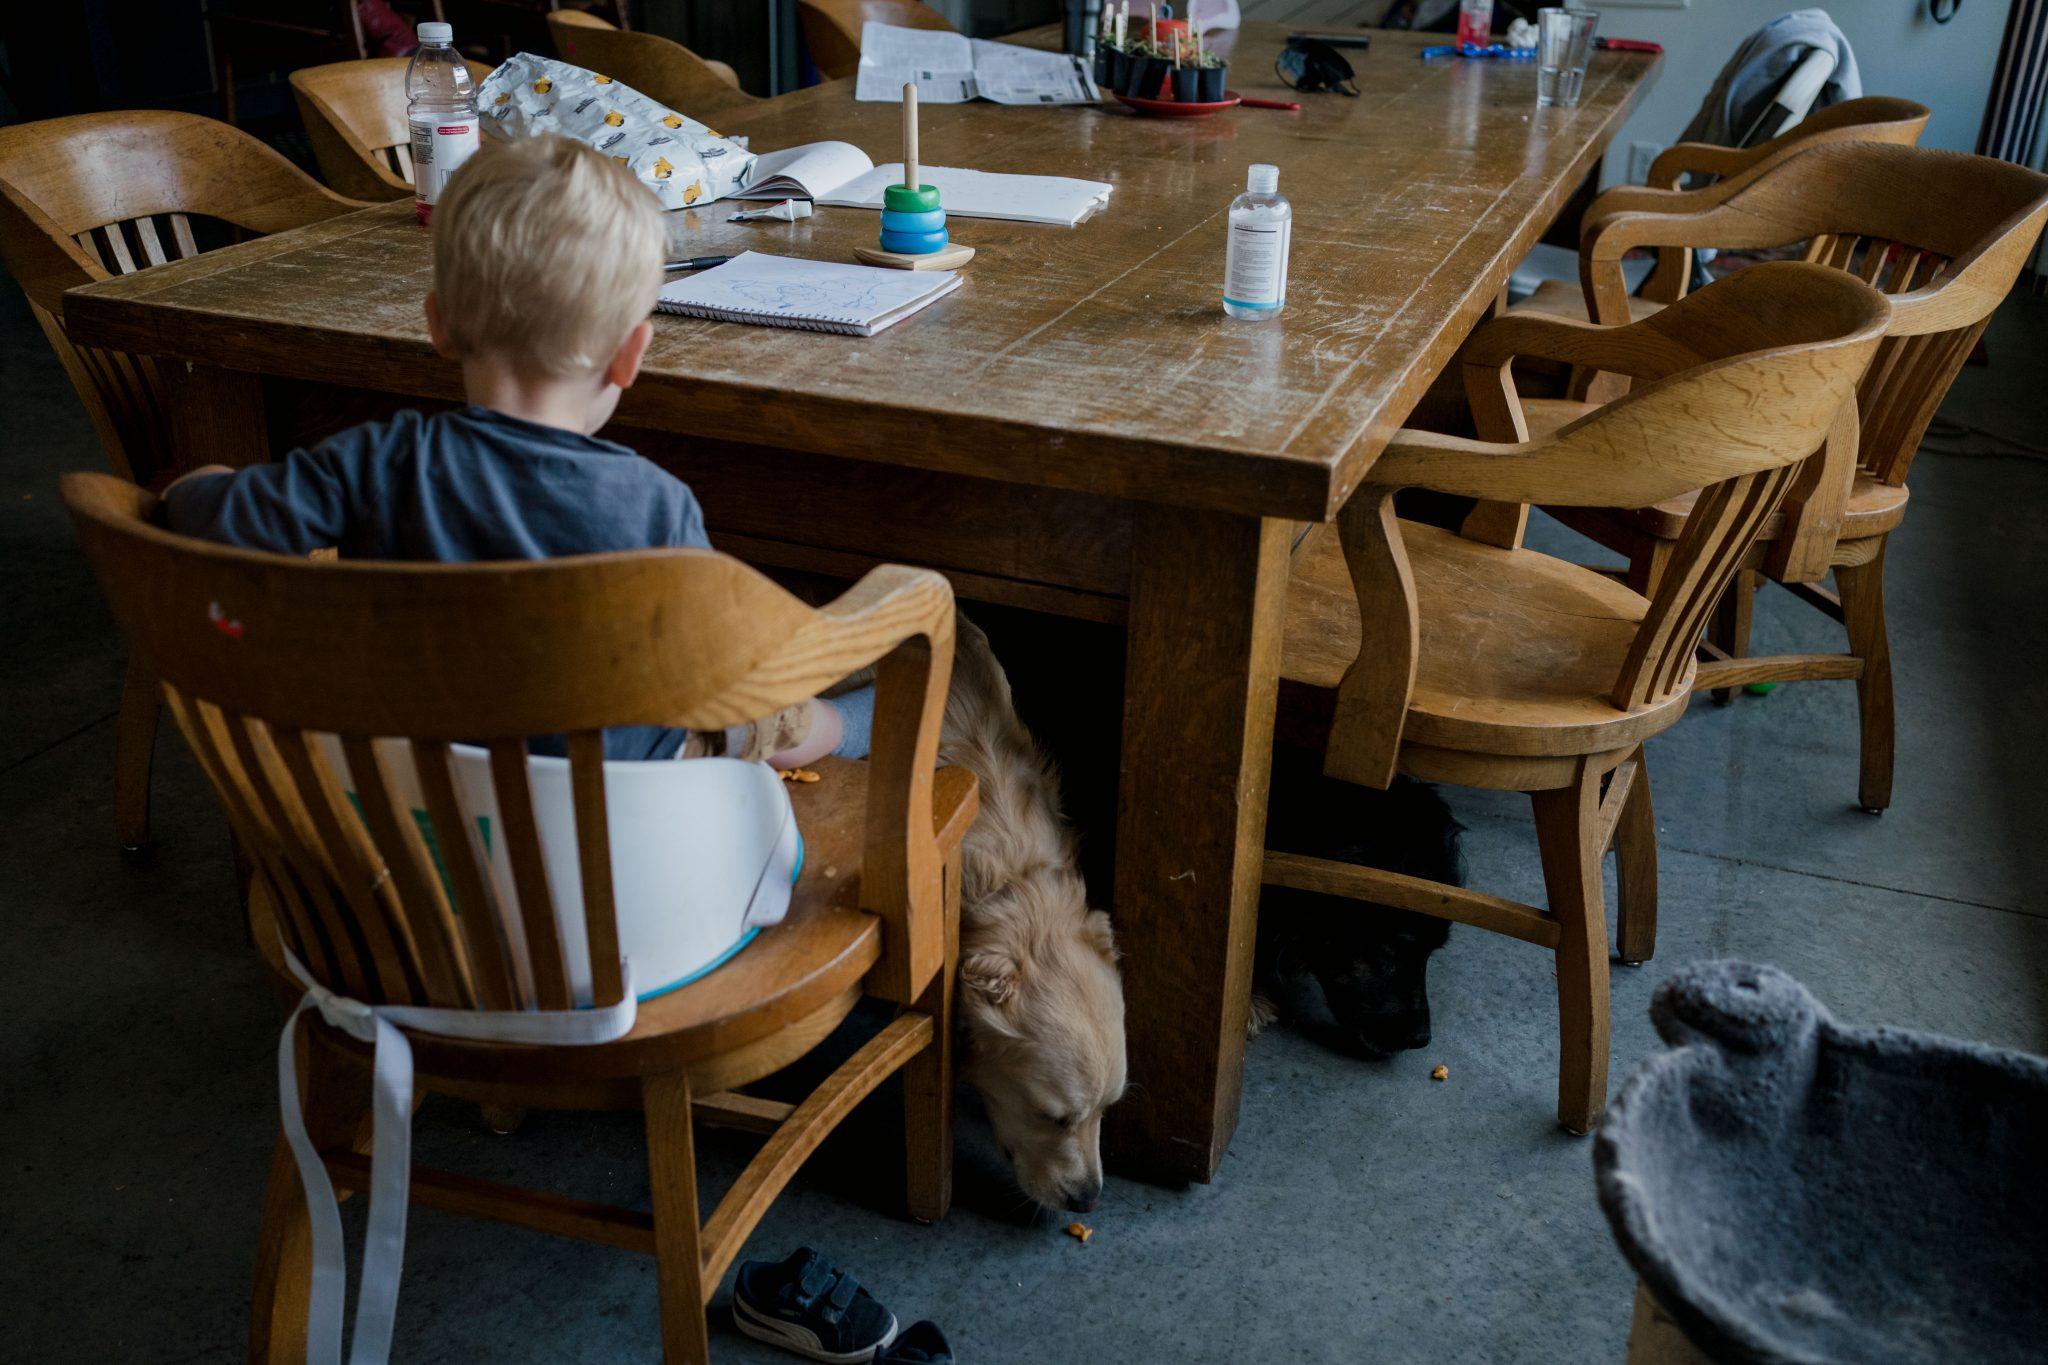 dogs eating snacks off floor